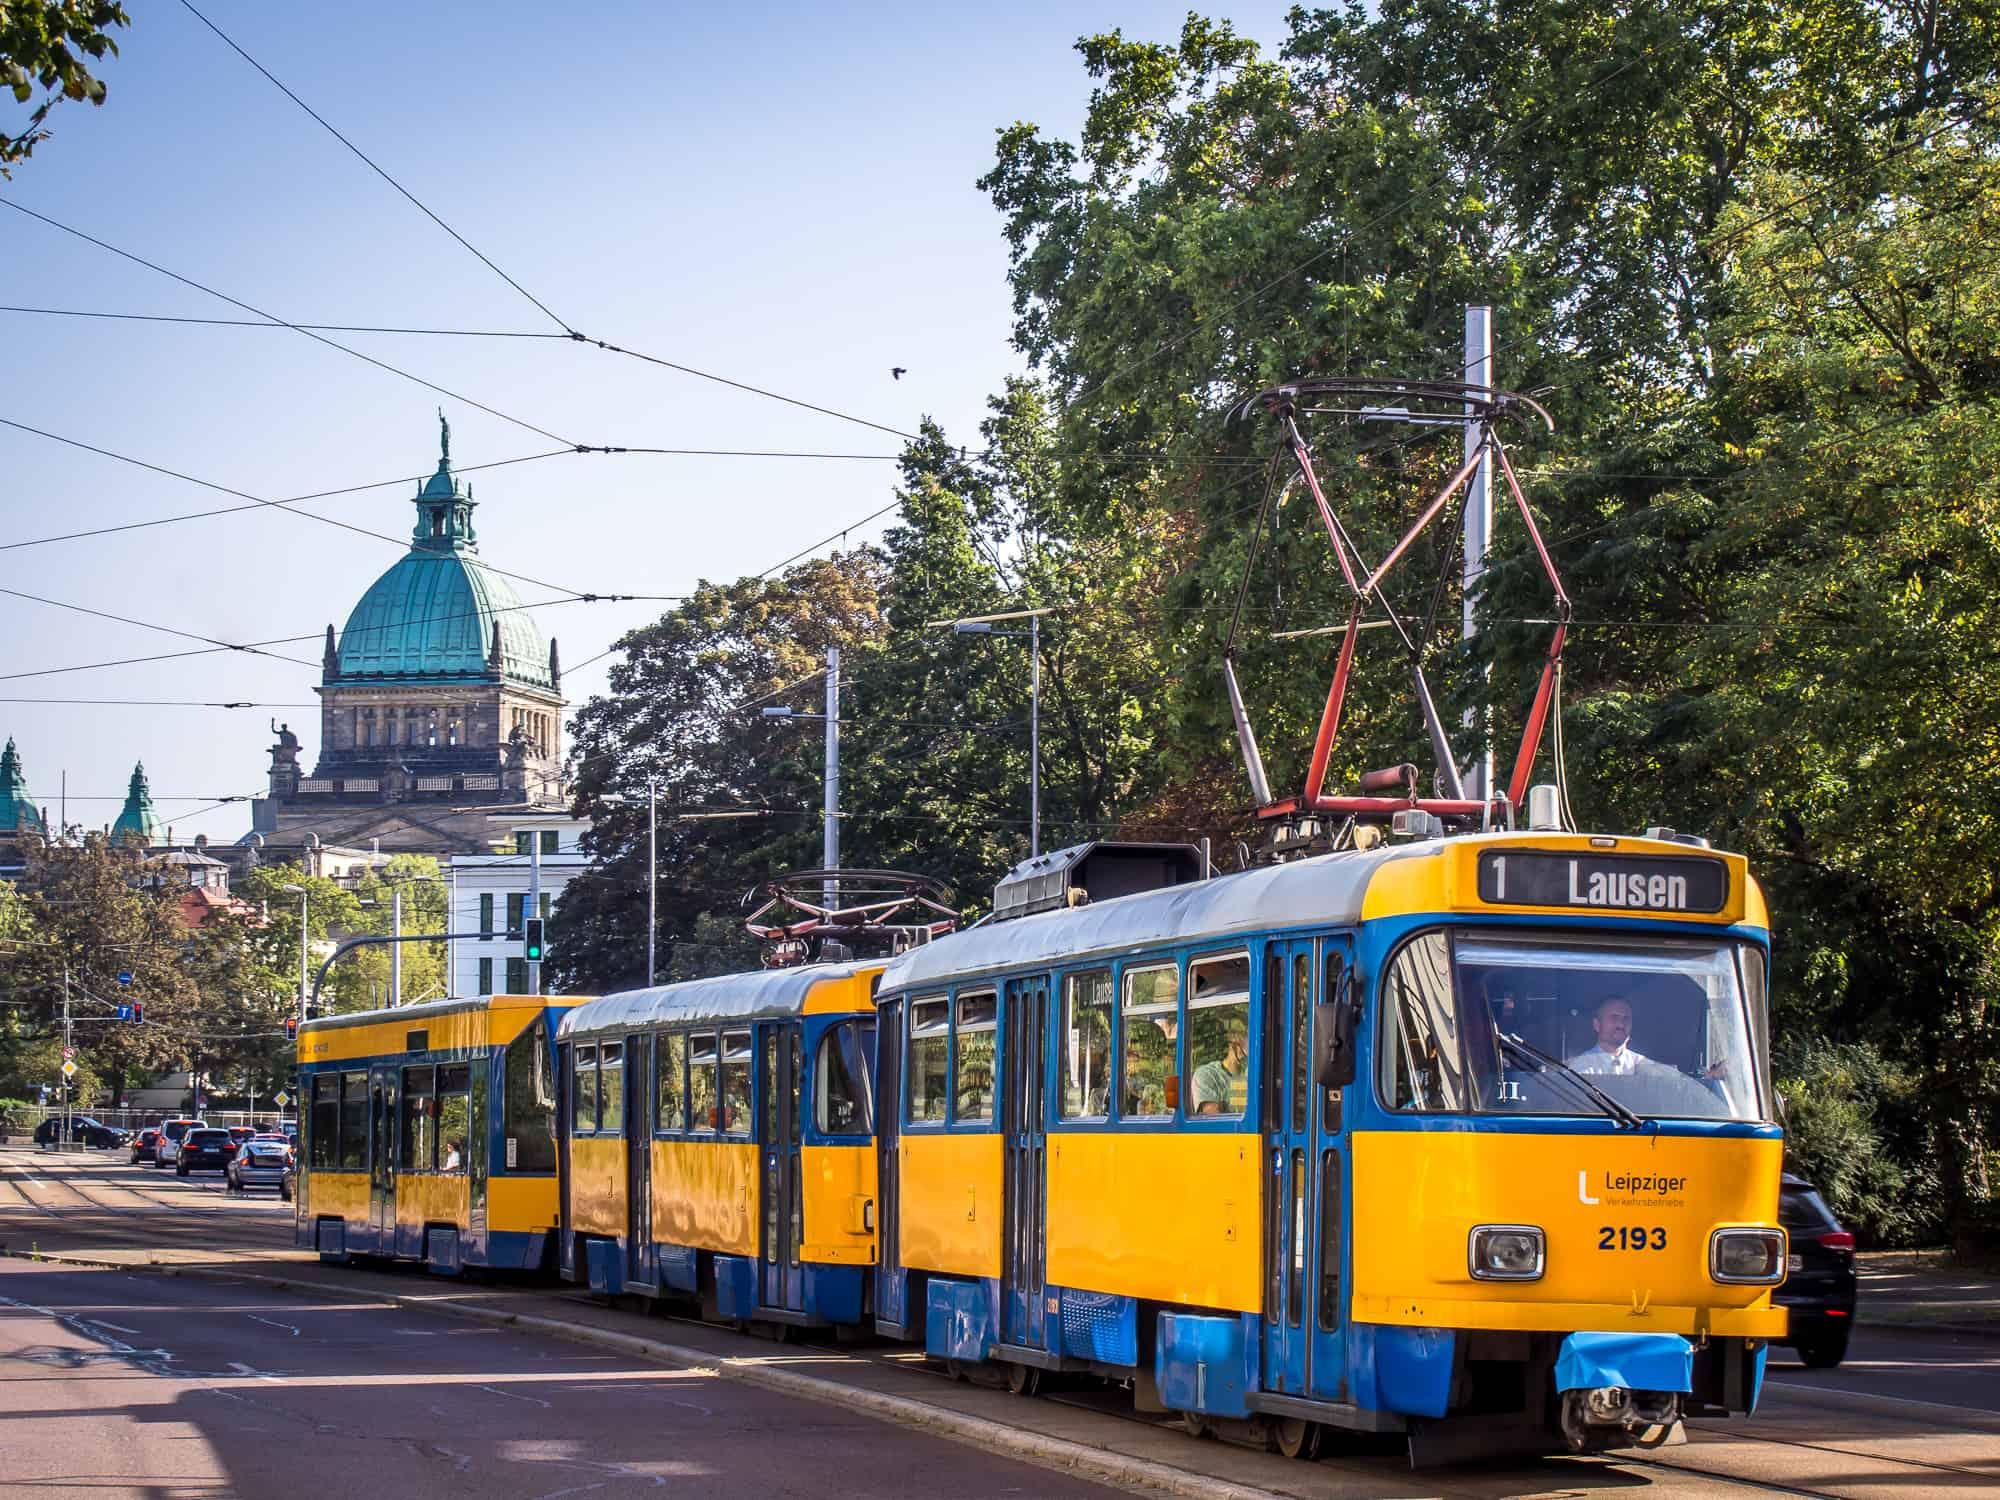 Tatra Leipzig Tram